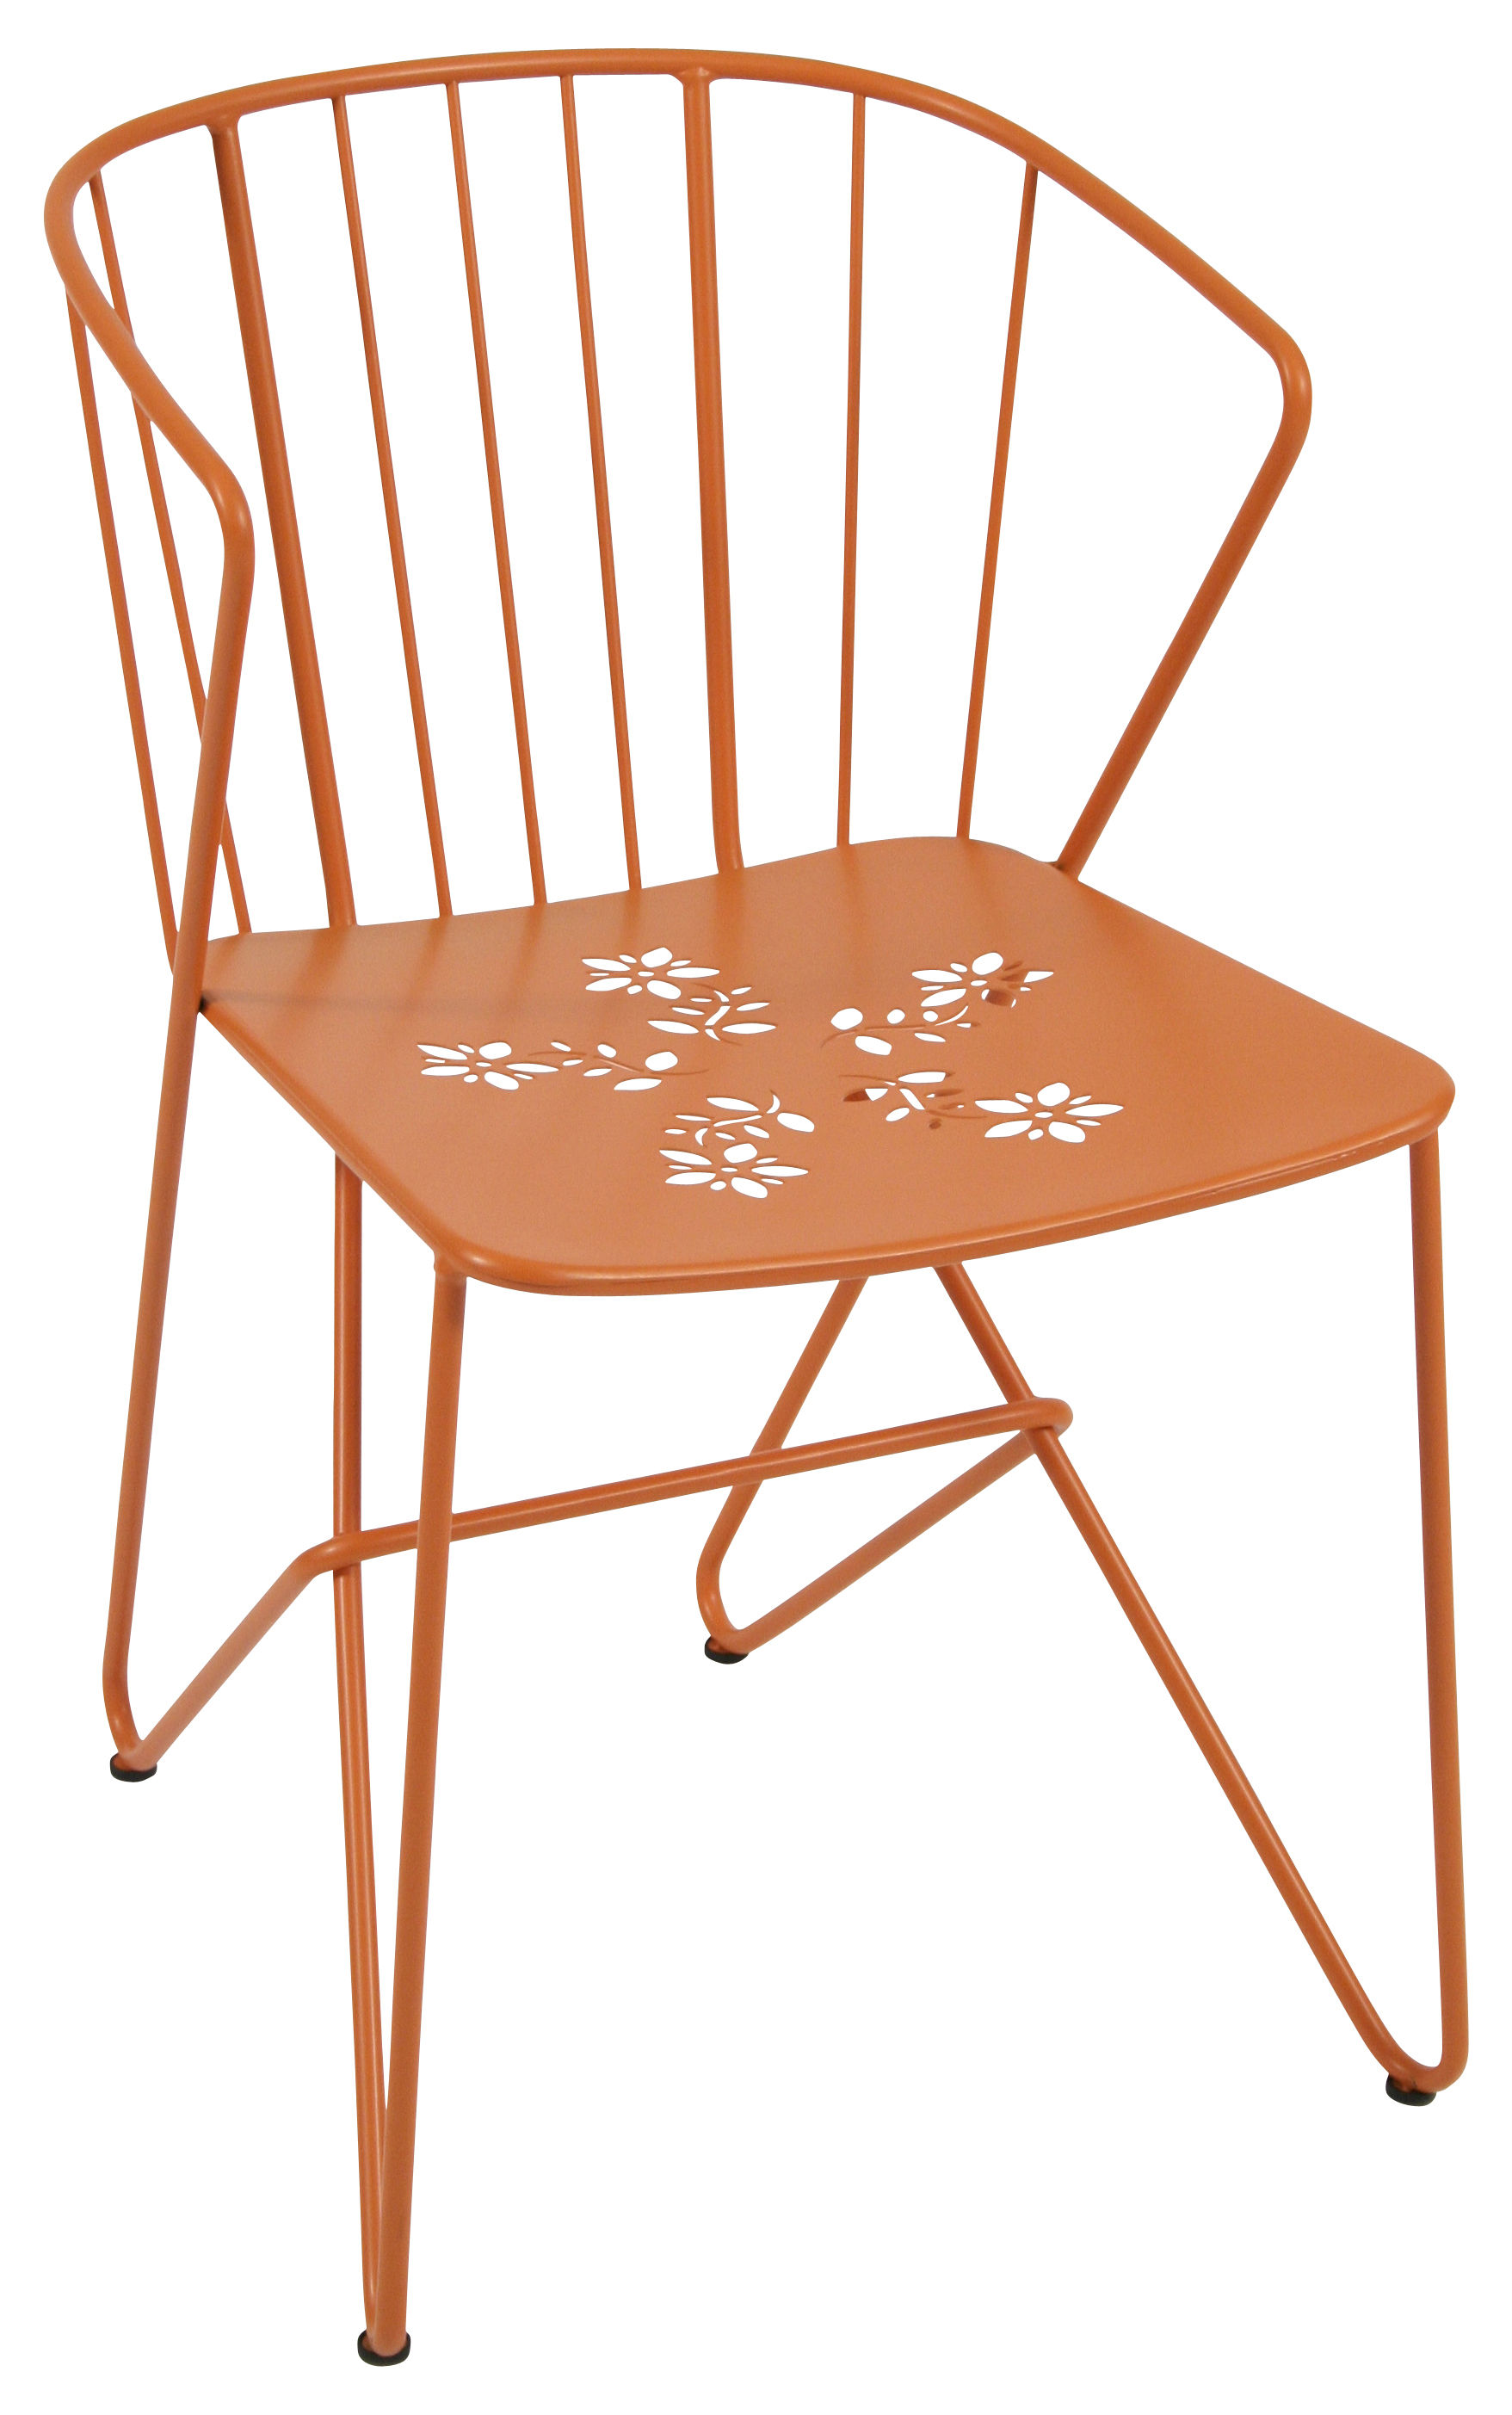 Arredamento - Sedie  - Poltrona Flower di Fermob - carota - Acciaio